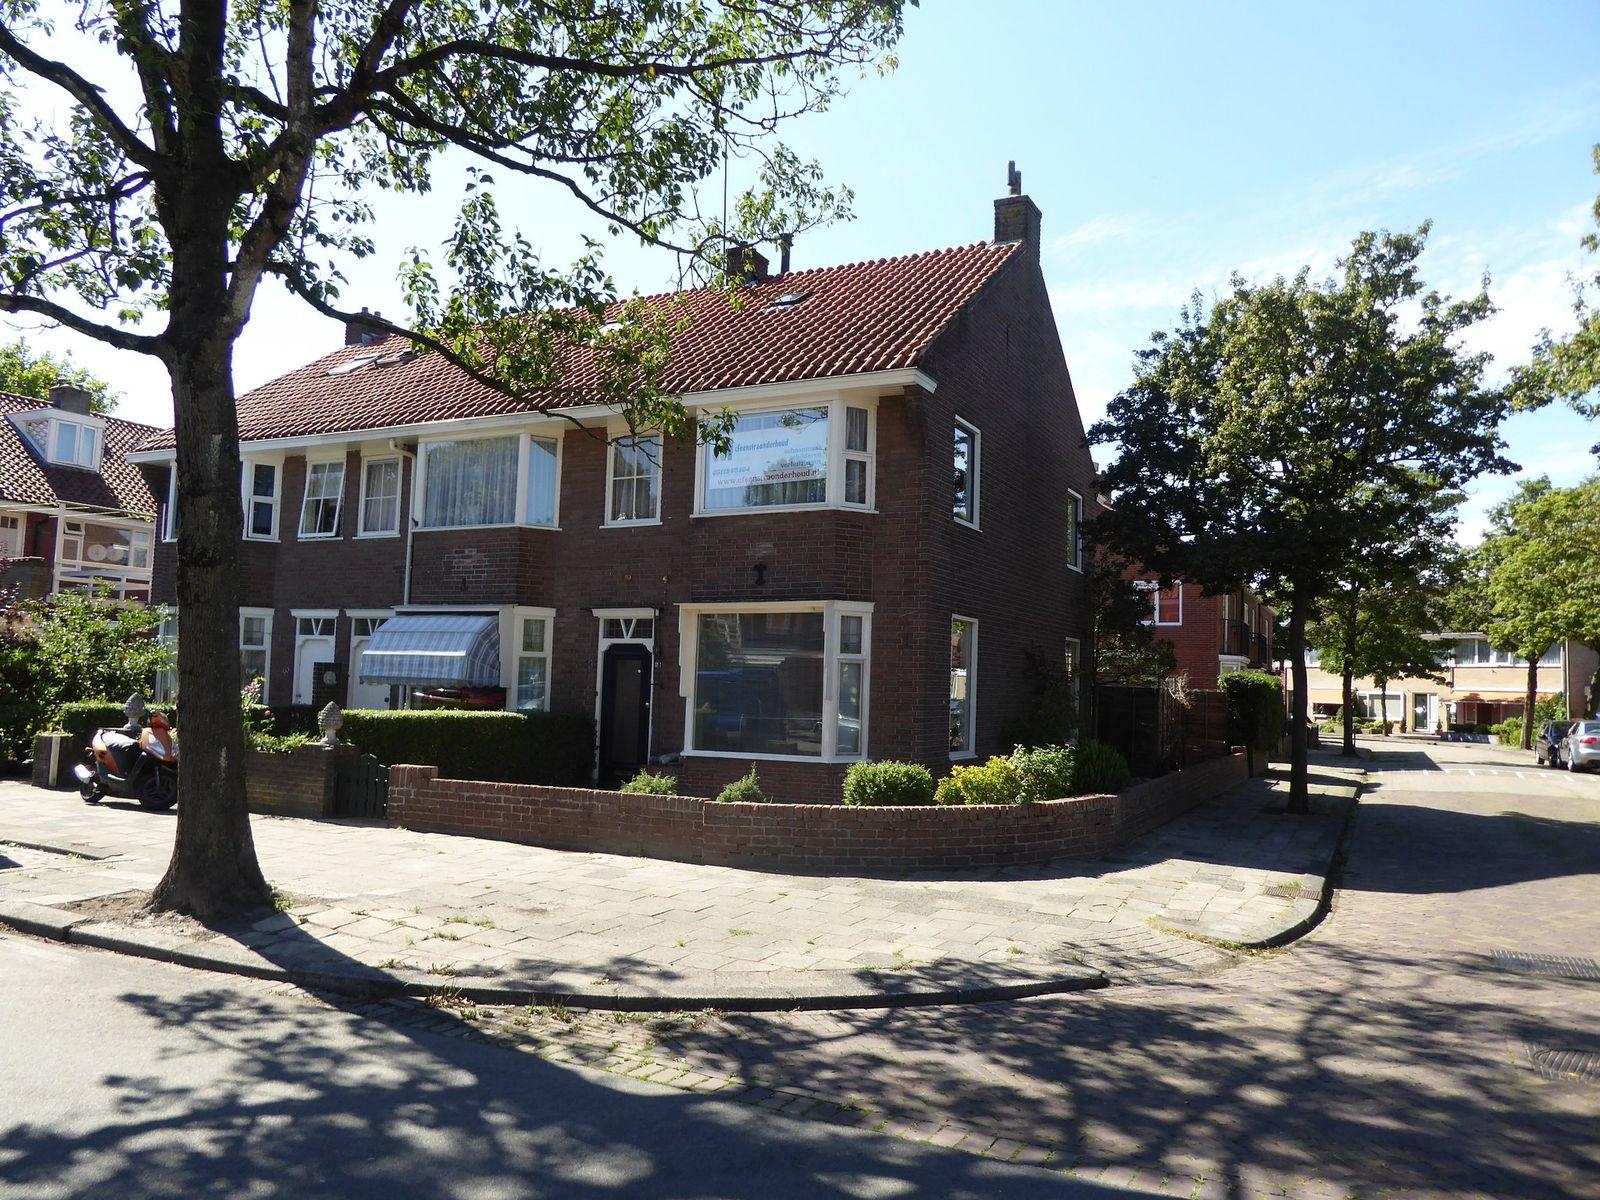 Pasteurweg 53, Leeuwarden